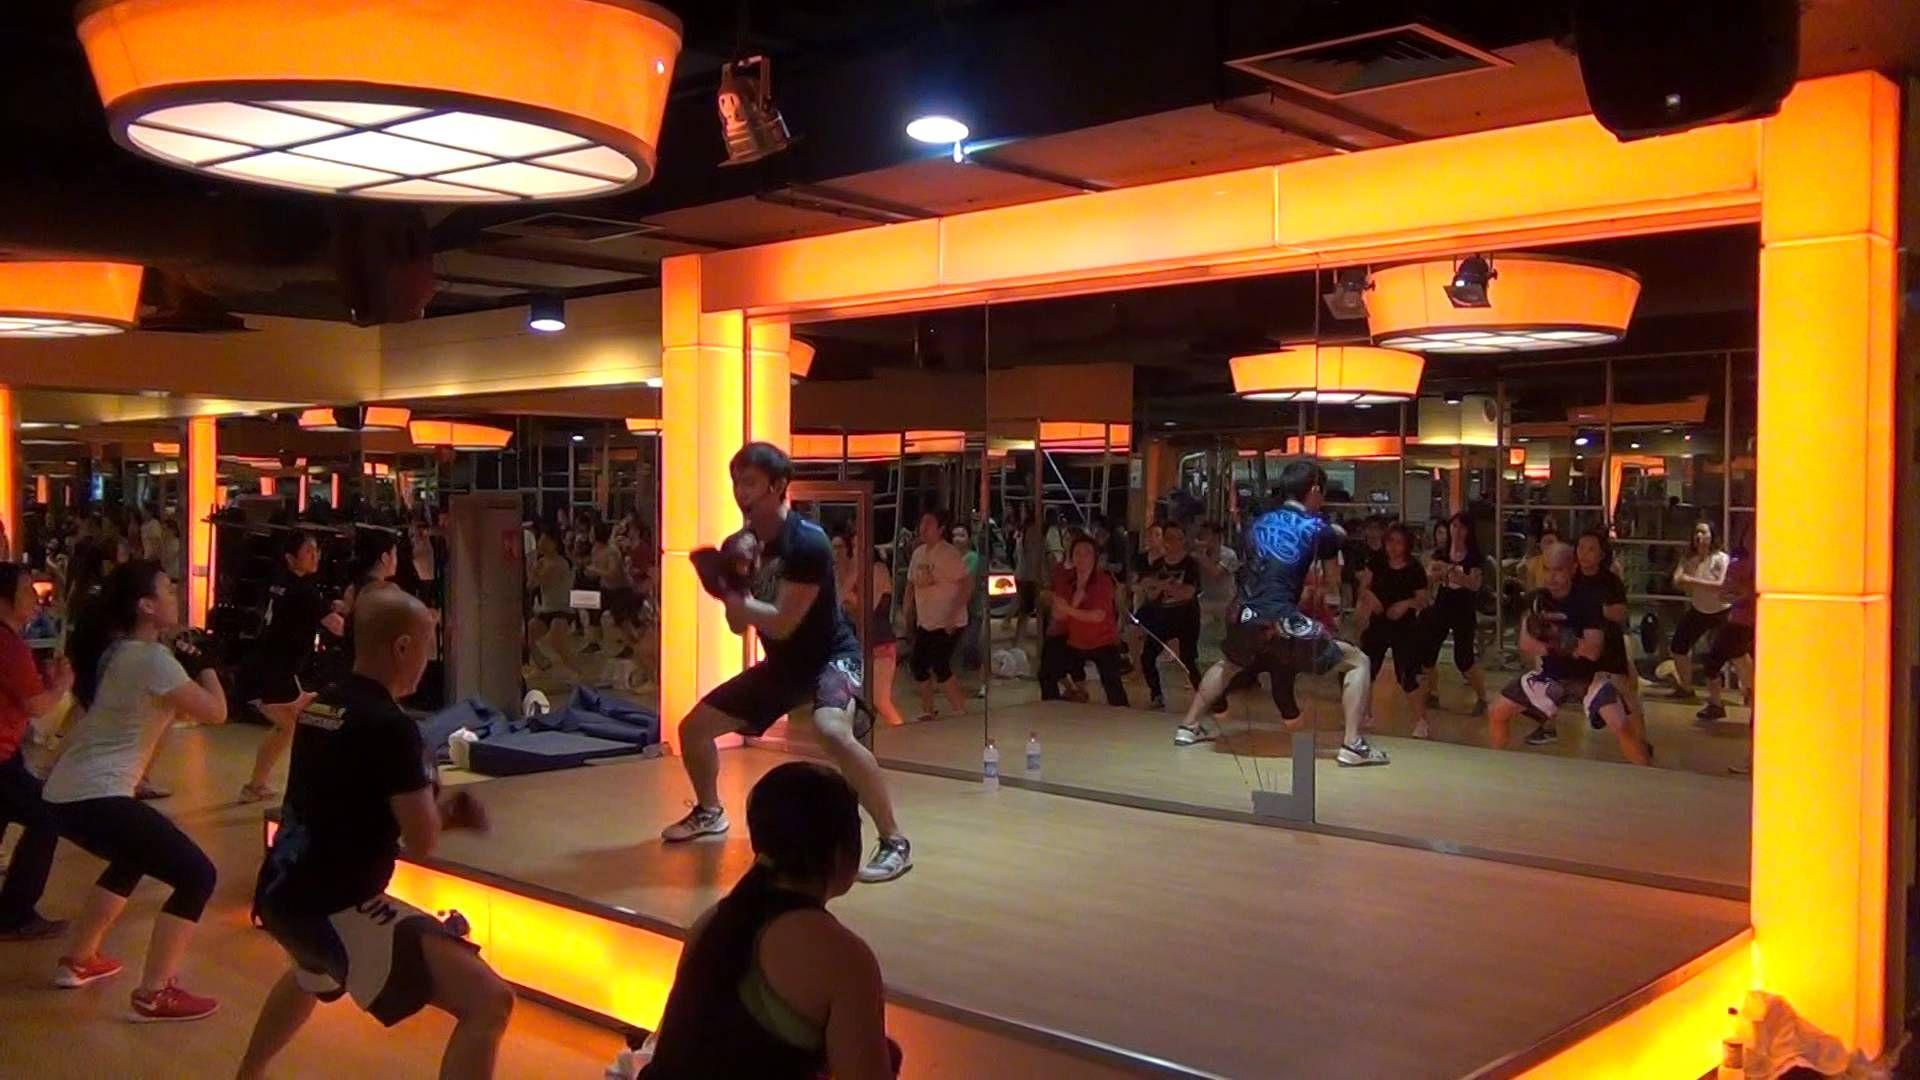 Body Combat Cardio with VJ (1) - YouTube